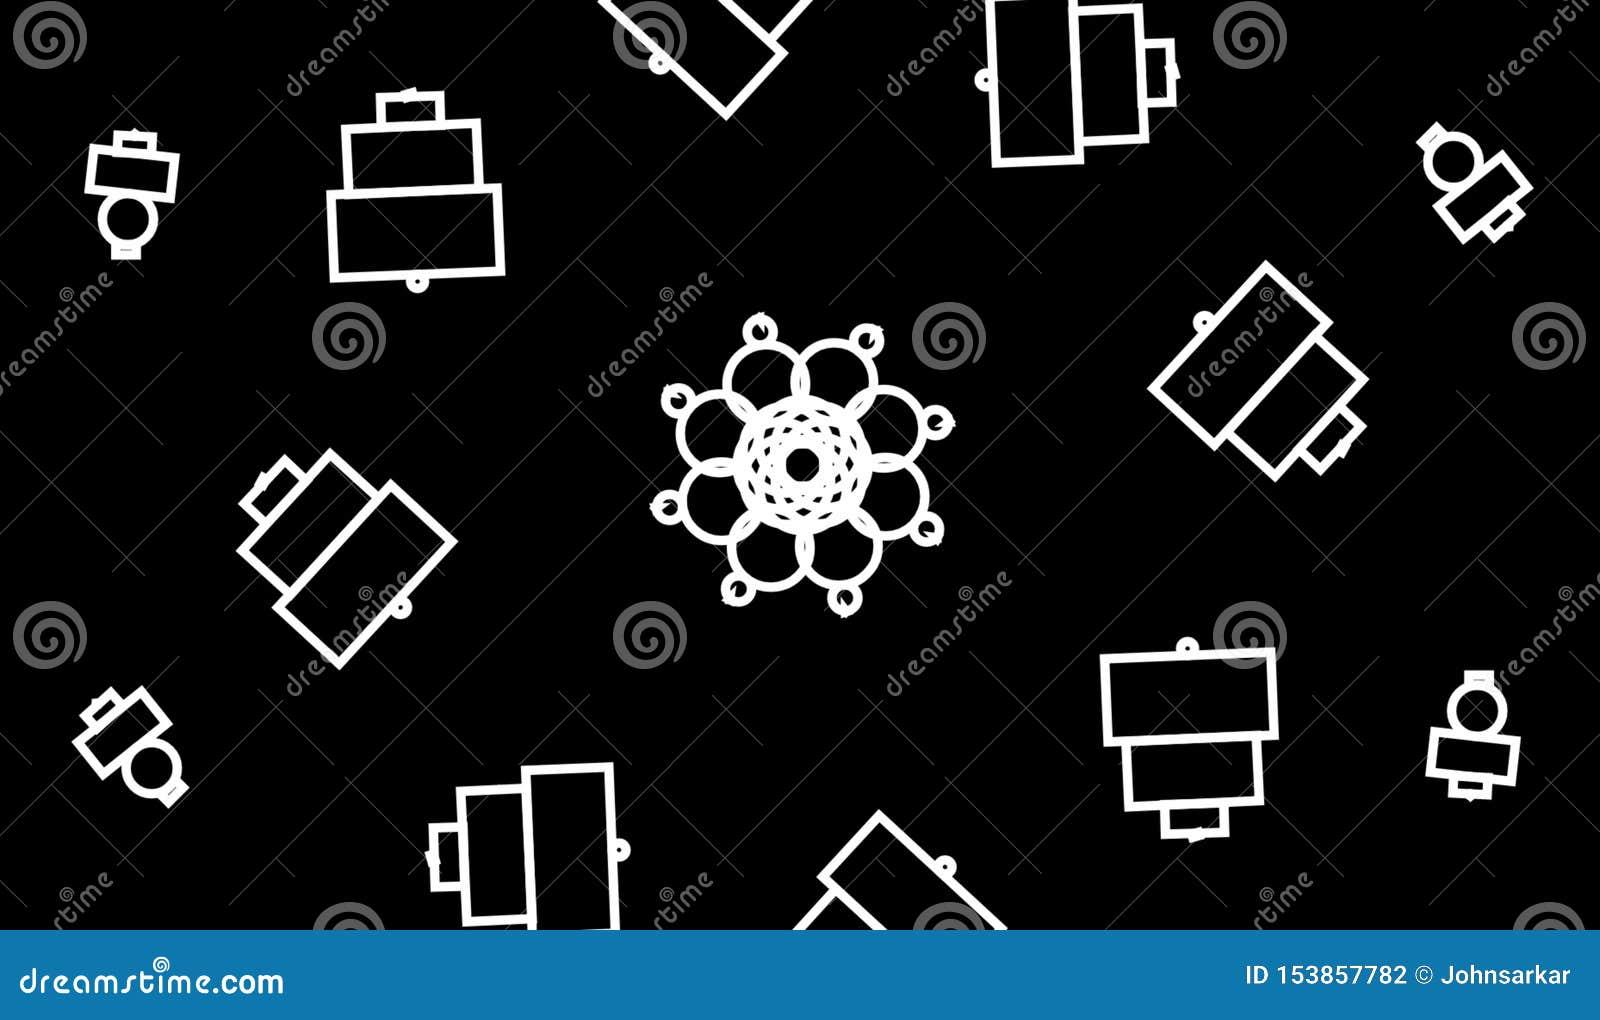 Abstracte grayscale geometrische achtergrond E